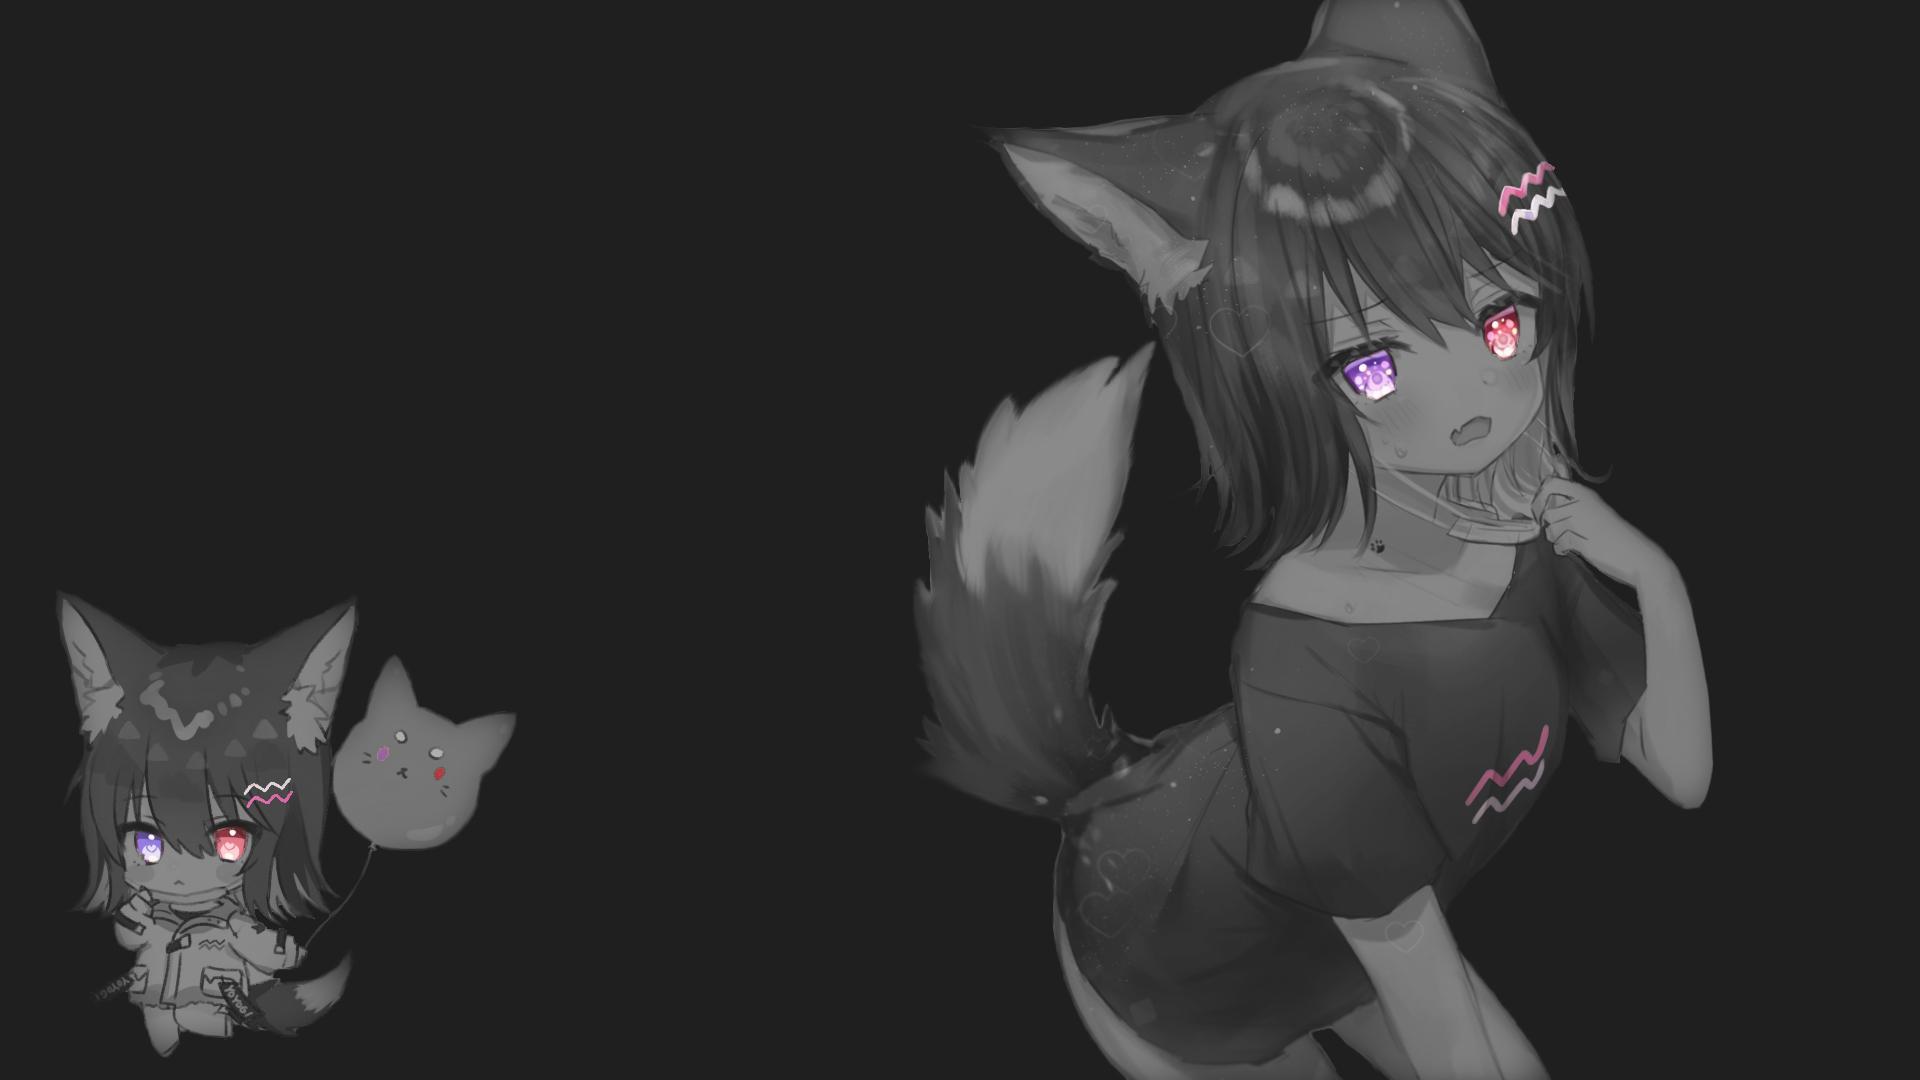 Dark Fox Girl Selective Coloring Anime Girls Simple Background Anime Wallpaper Resolution 1920x1080 Id 960202 Wallha Com